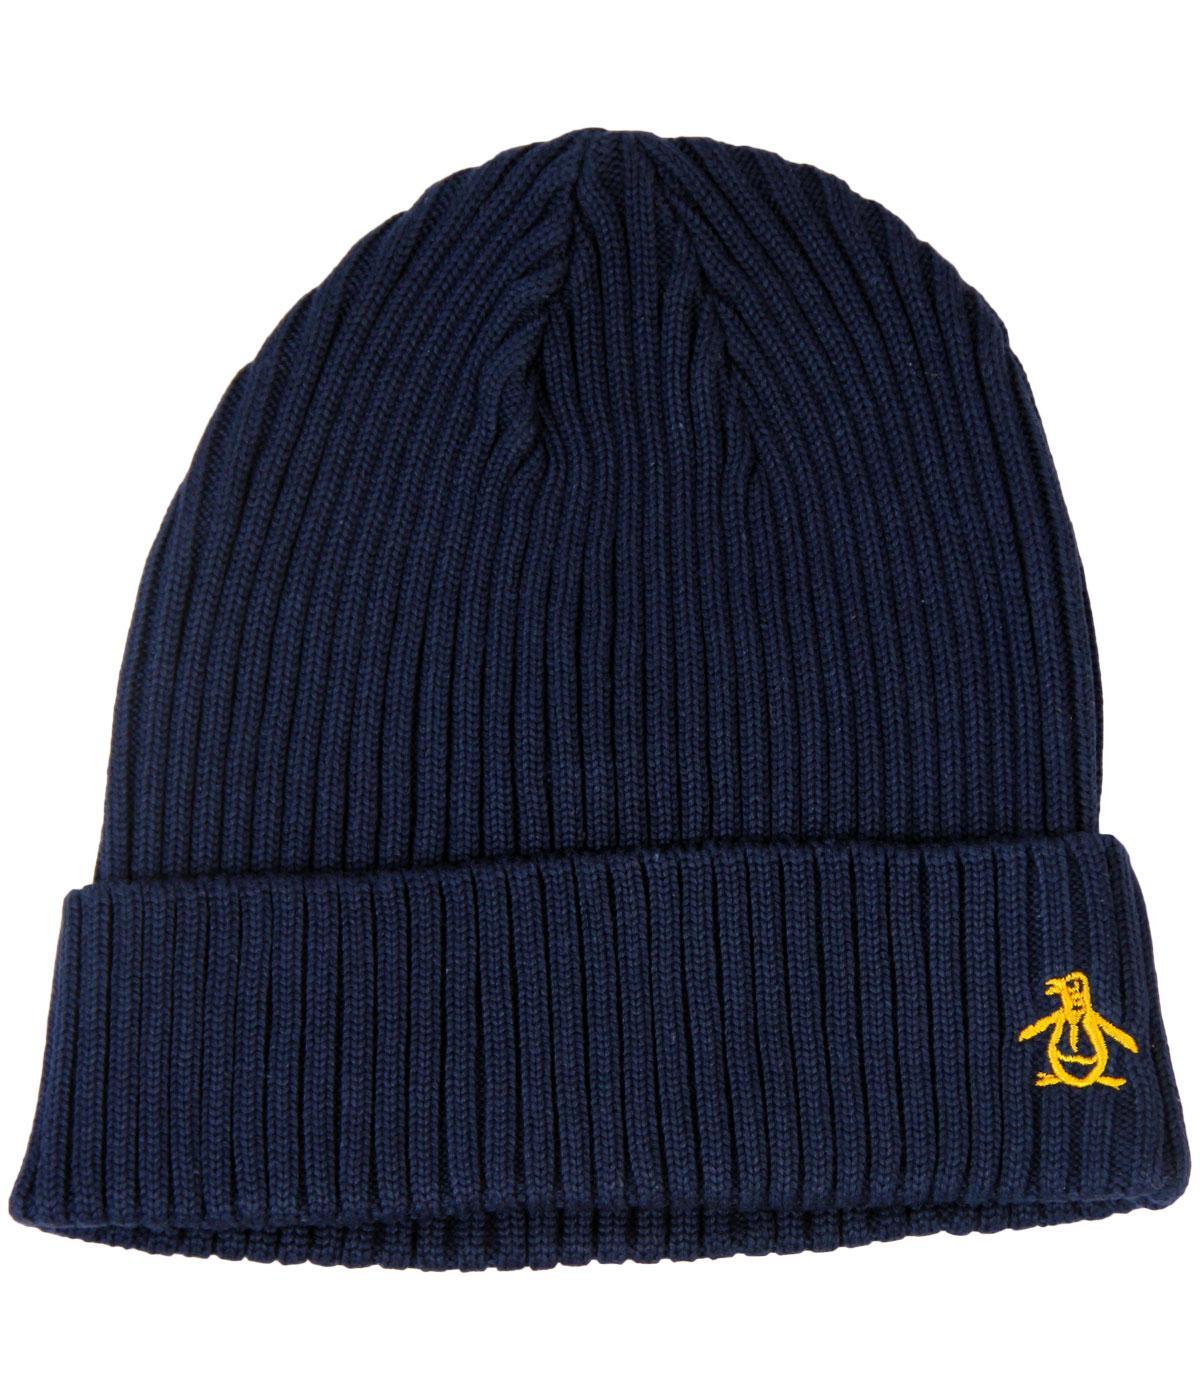 ORIGINAL PENGUIN Ribe Retro 70s Rib Beanie Hat in Dark Sapphire f6d475f174b